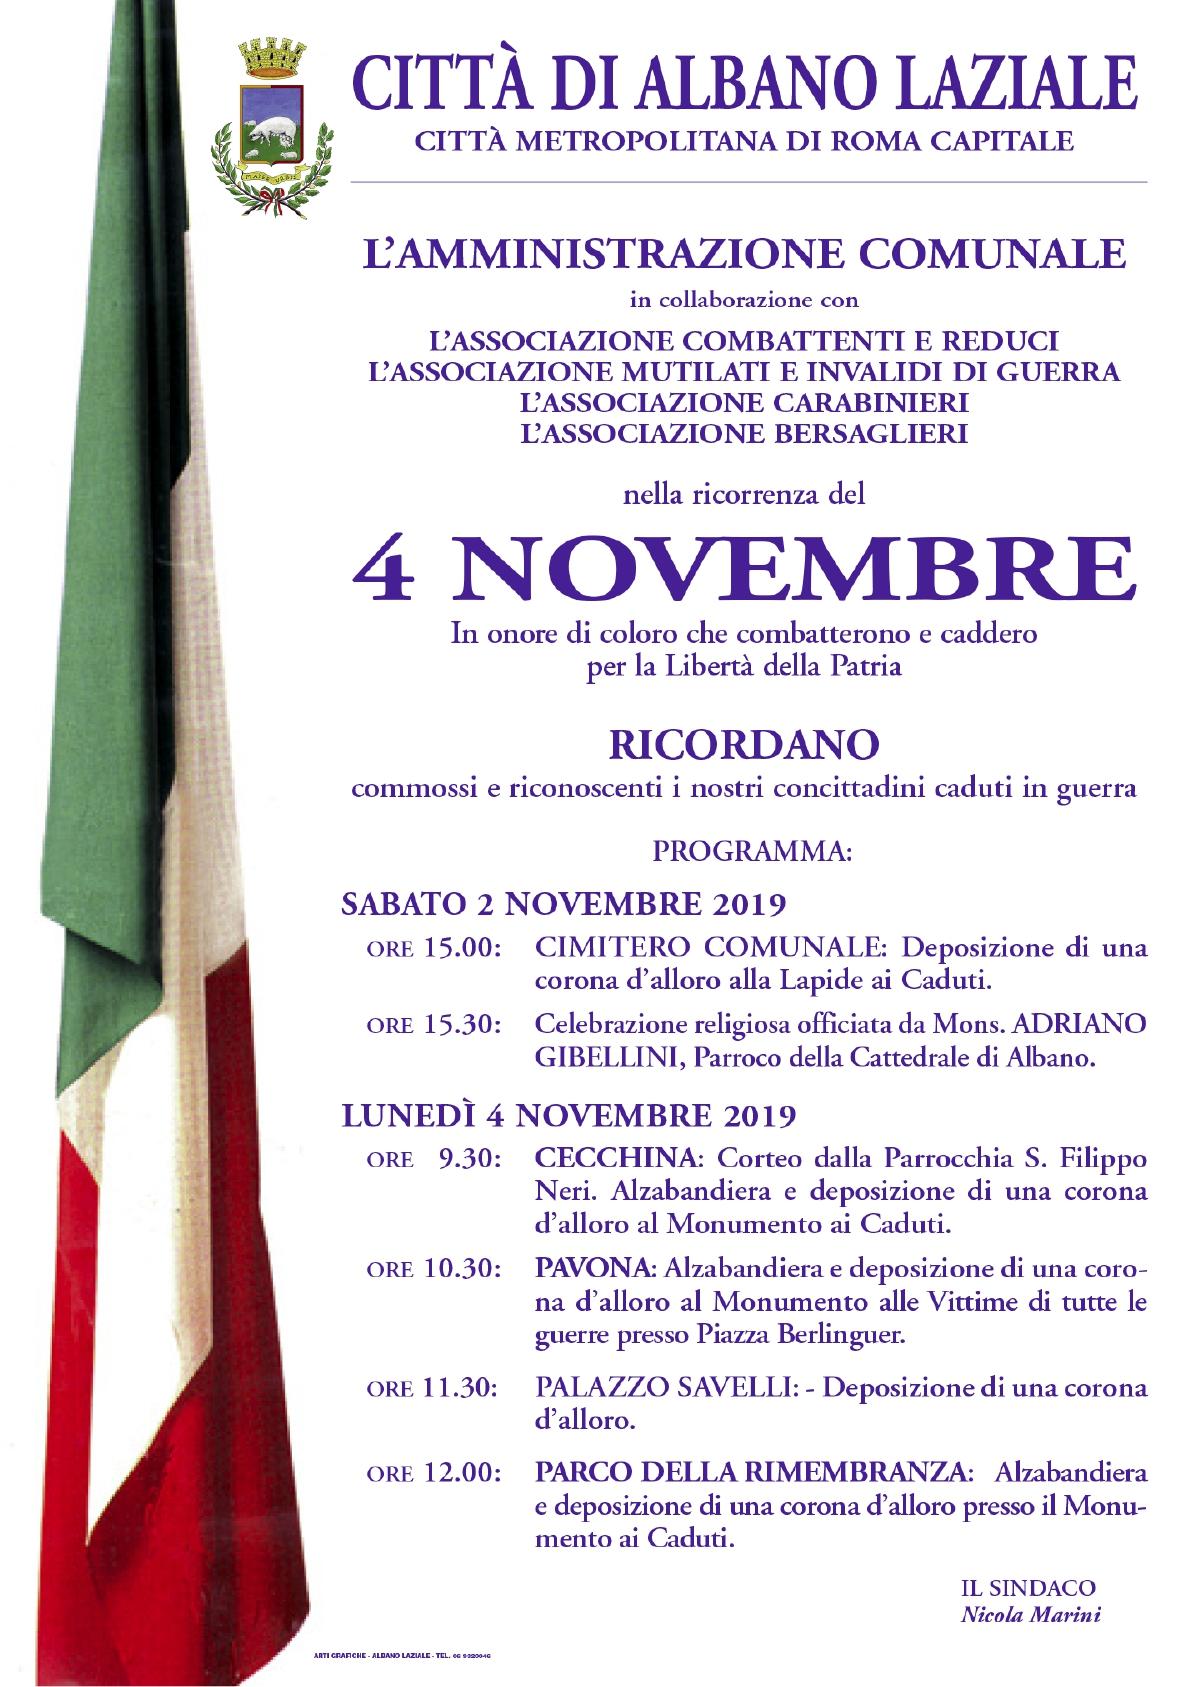 Manifesto 4 novembre